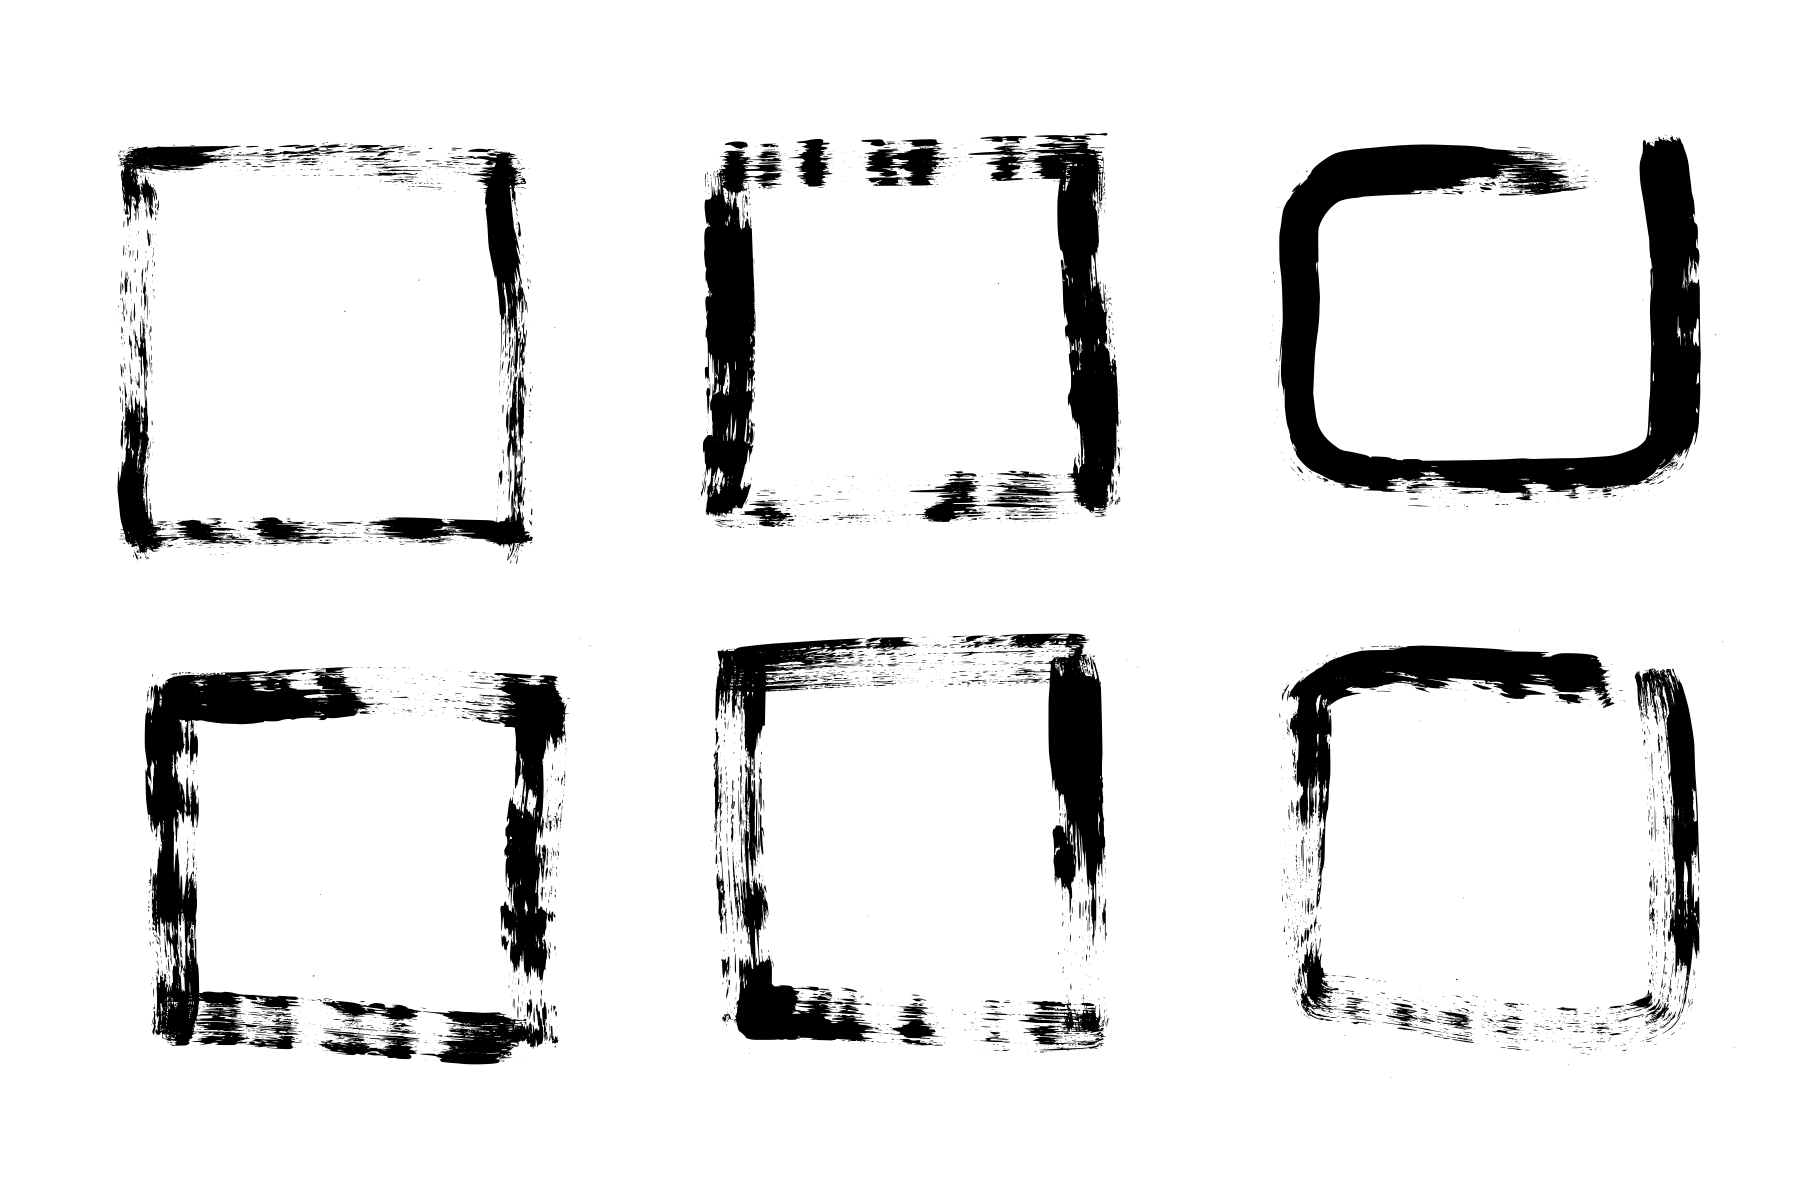 6-grunge-brush-stroke-square-frame-cover.png